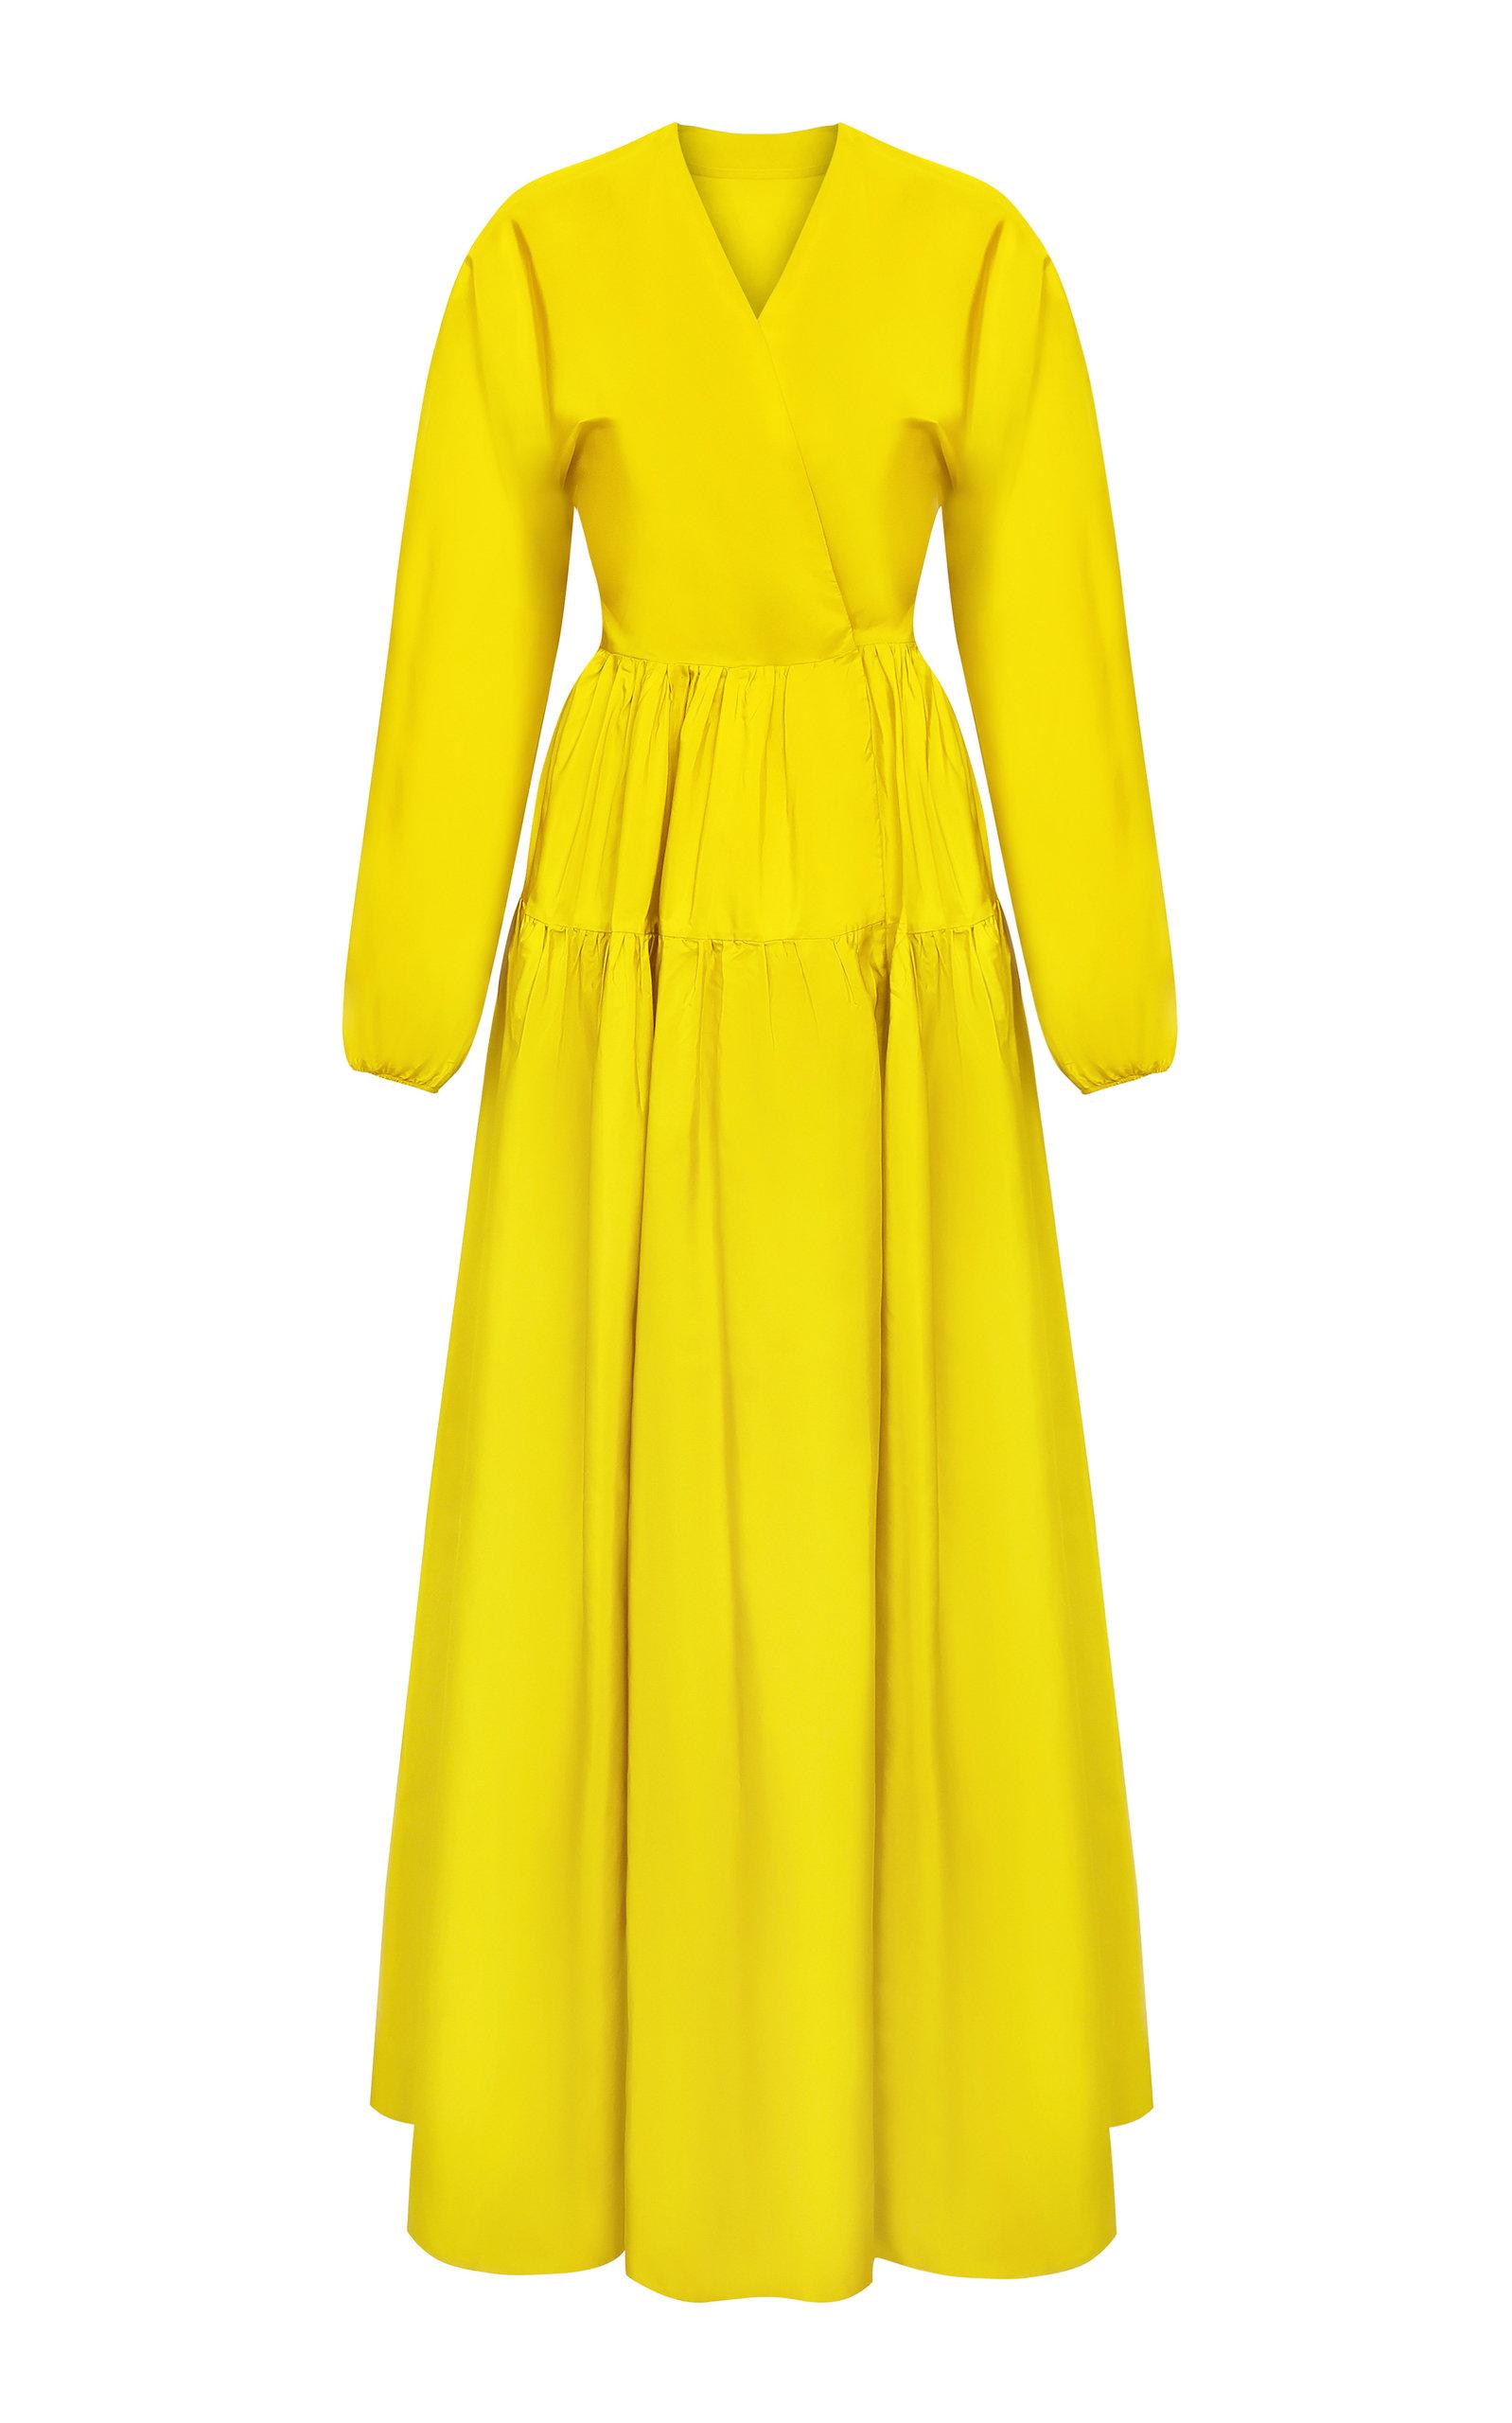 ABADIA Tiered Silk Maxi Dress in Yellow